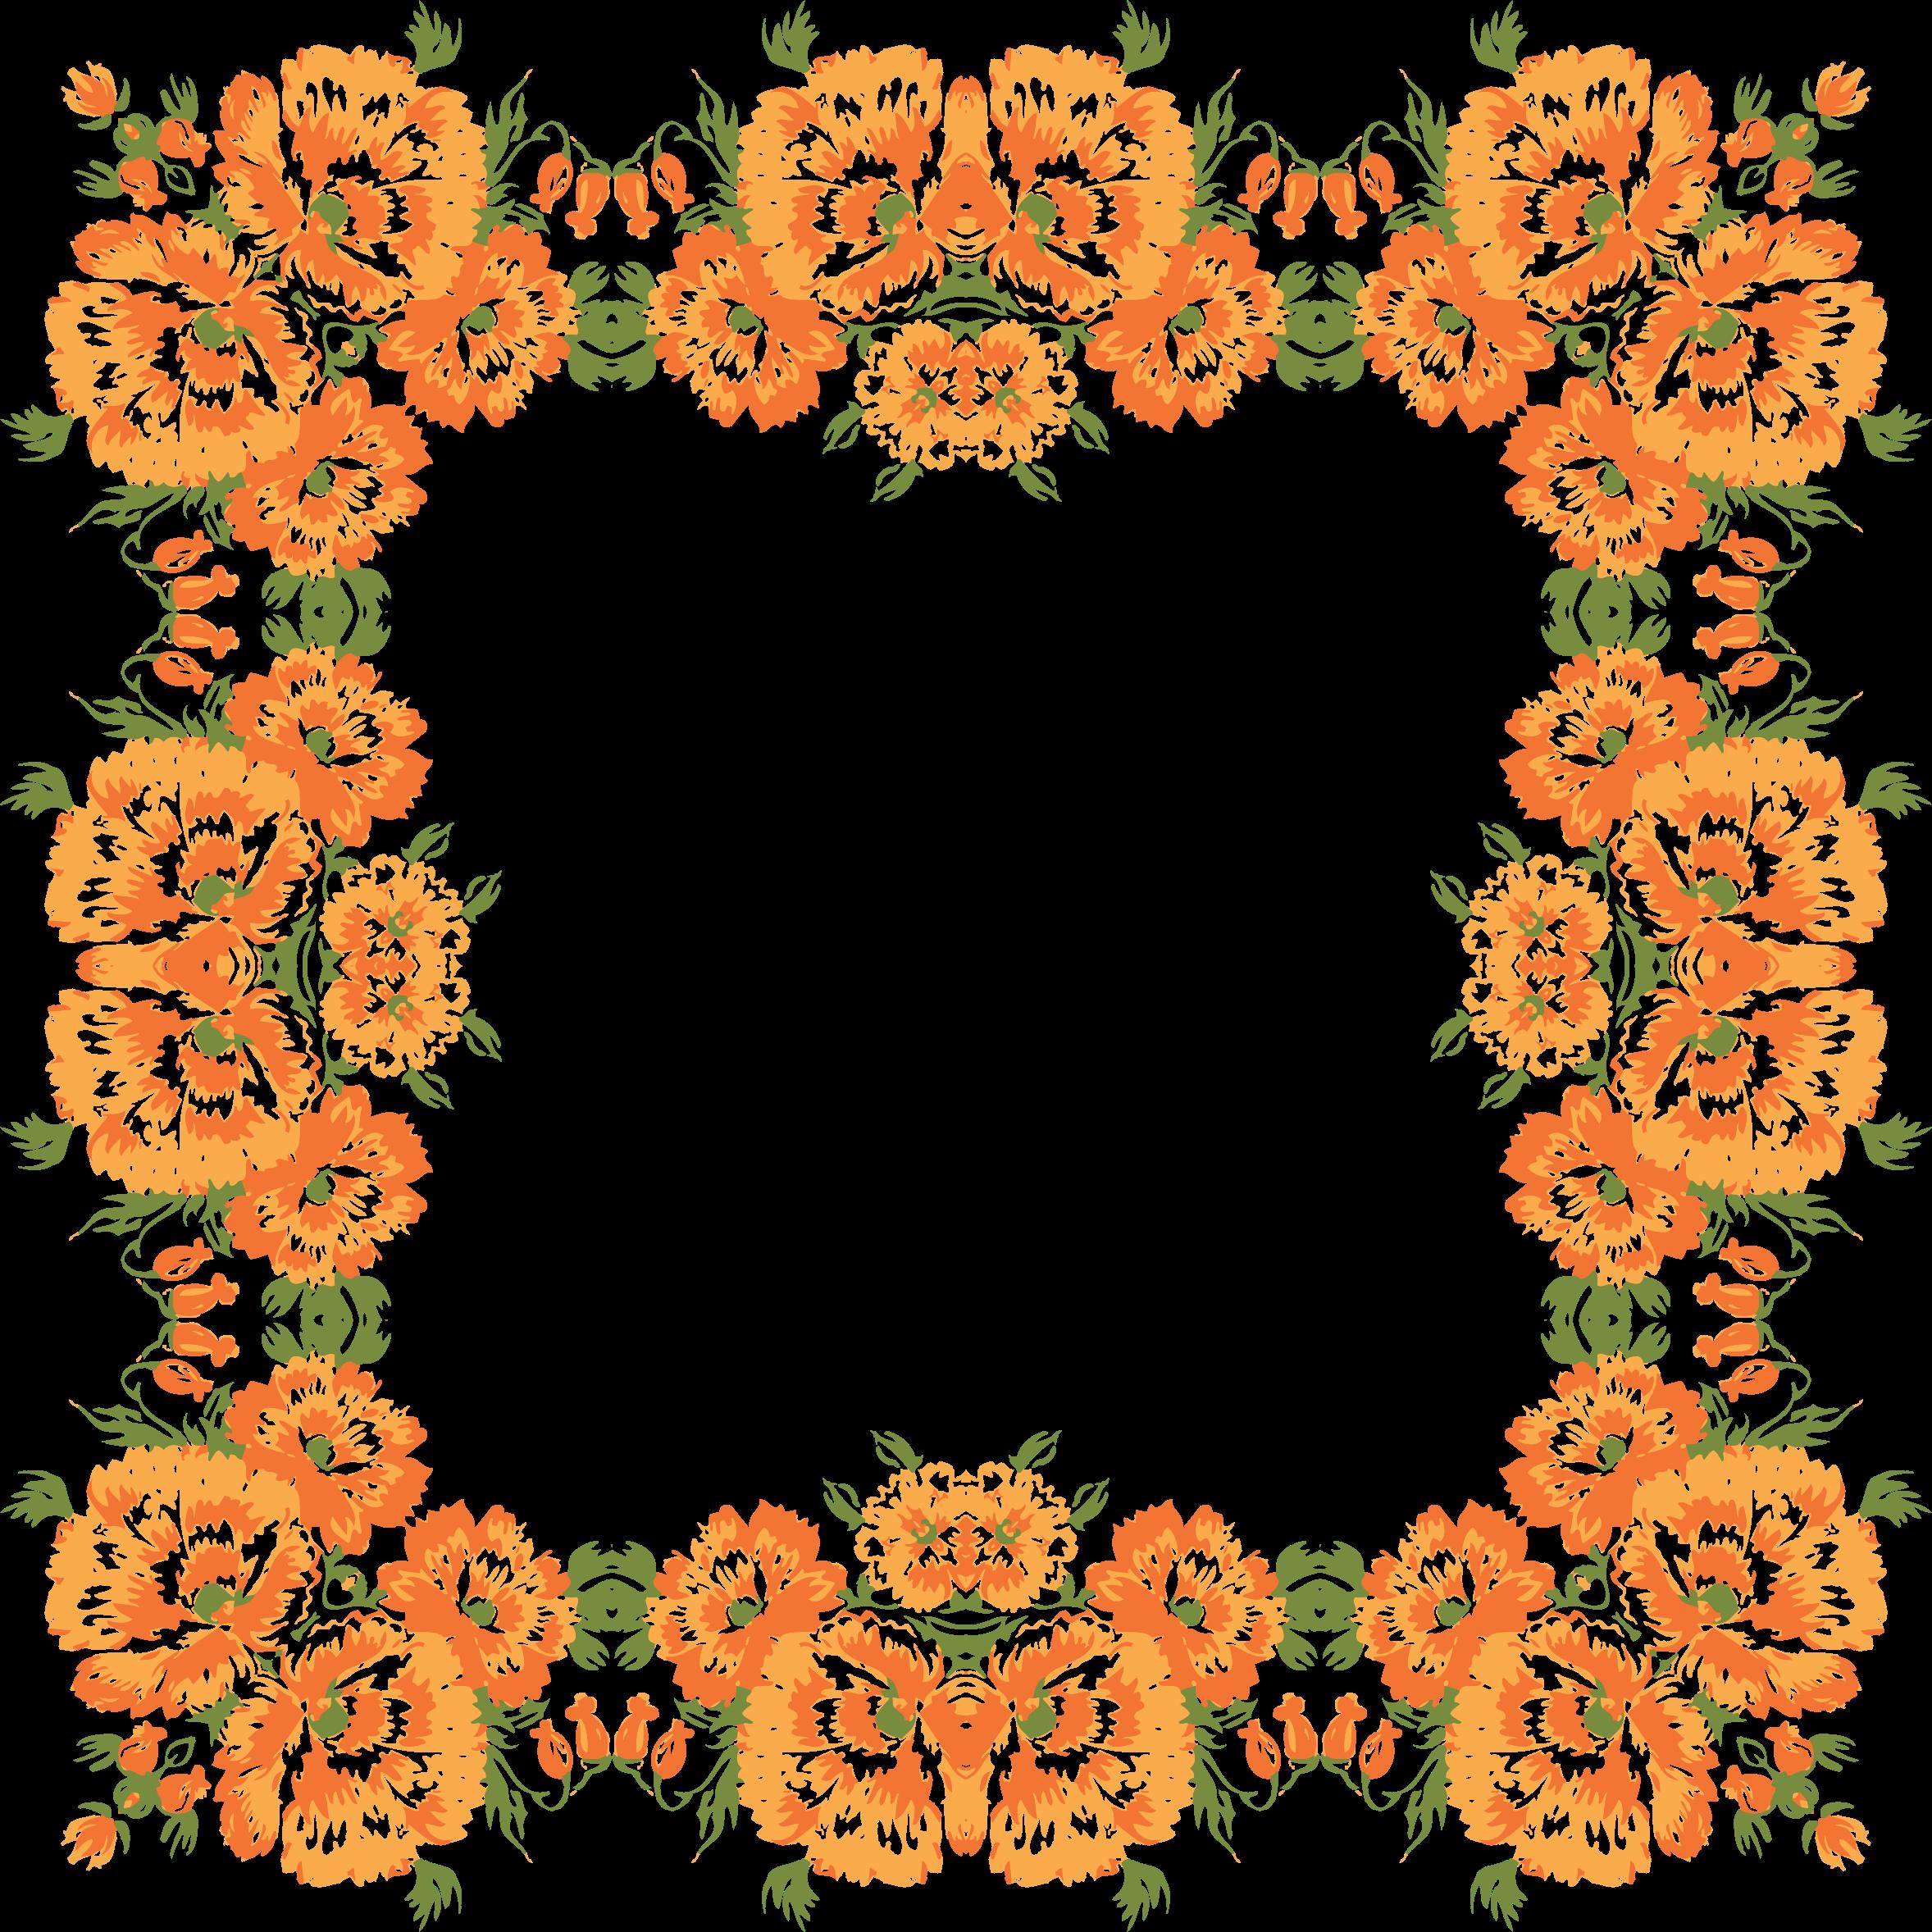 png transparent stock Wreath frame clipart. Floral big image png